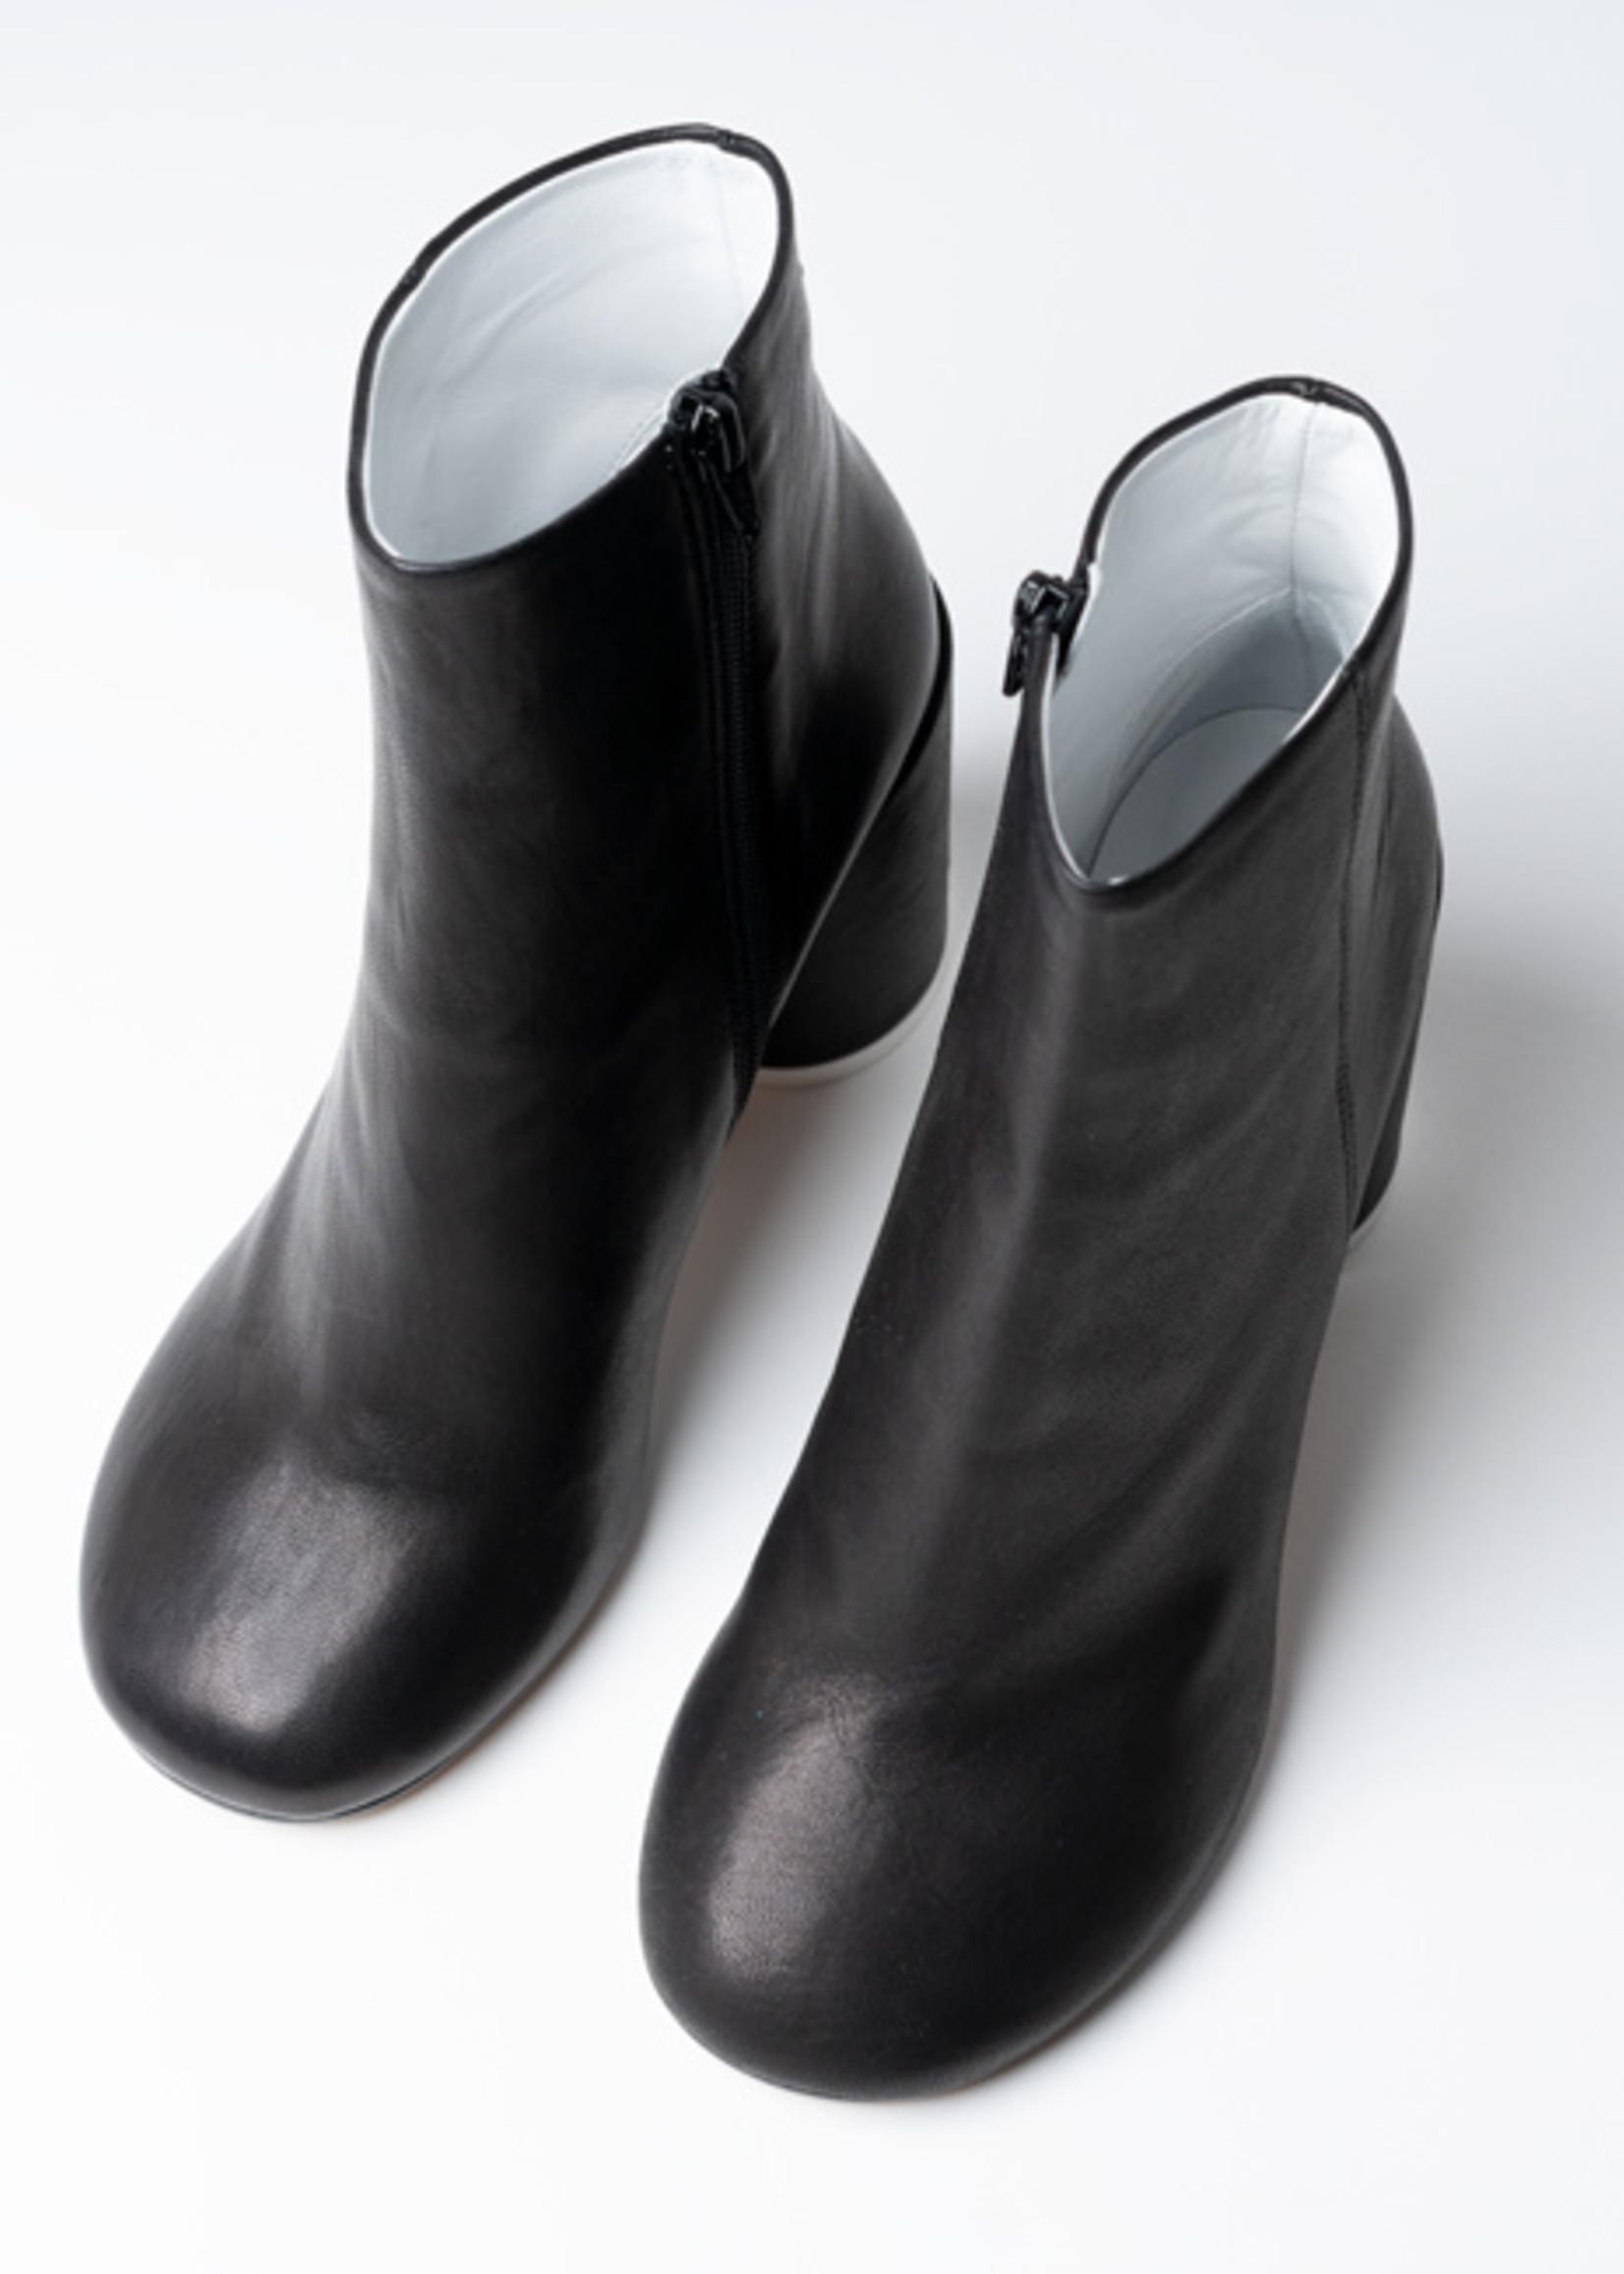 MM6 MAISON MARGIELA 6 Heel Leather Boots: Black